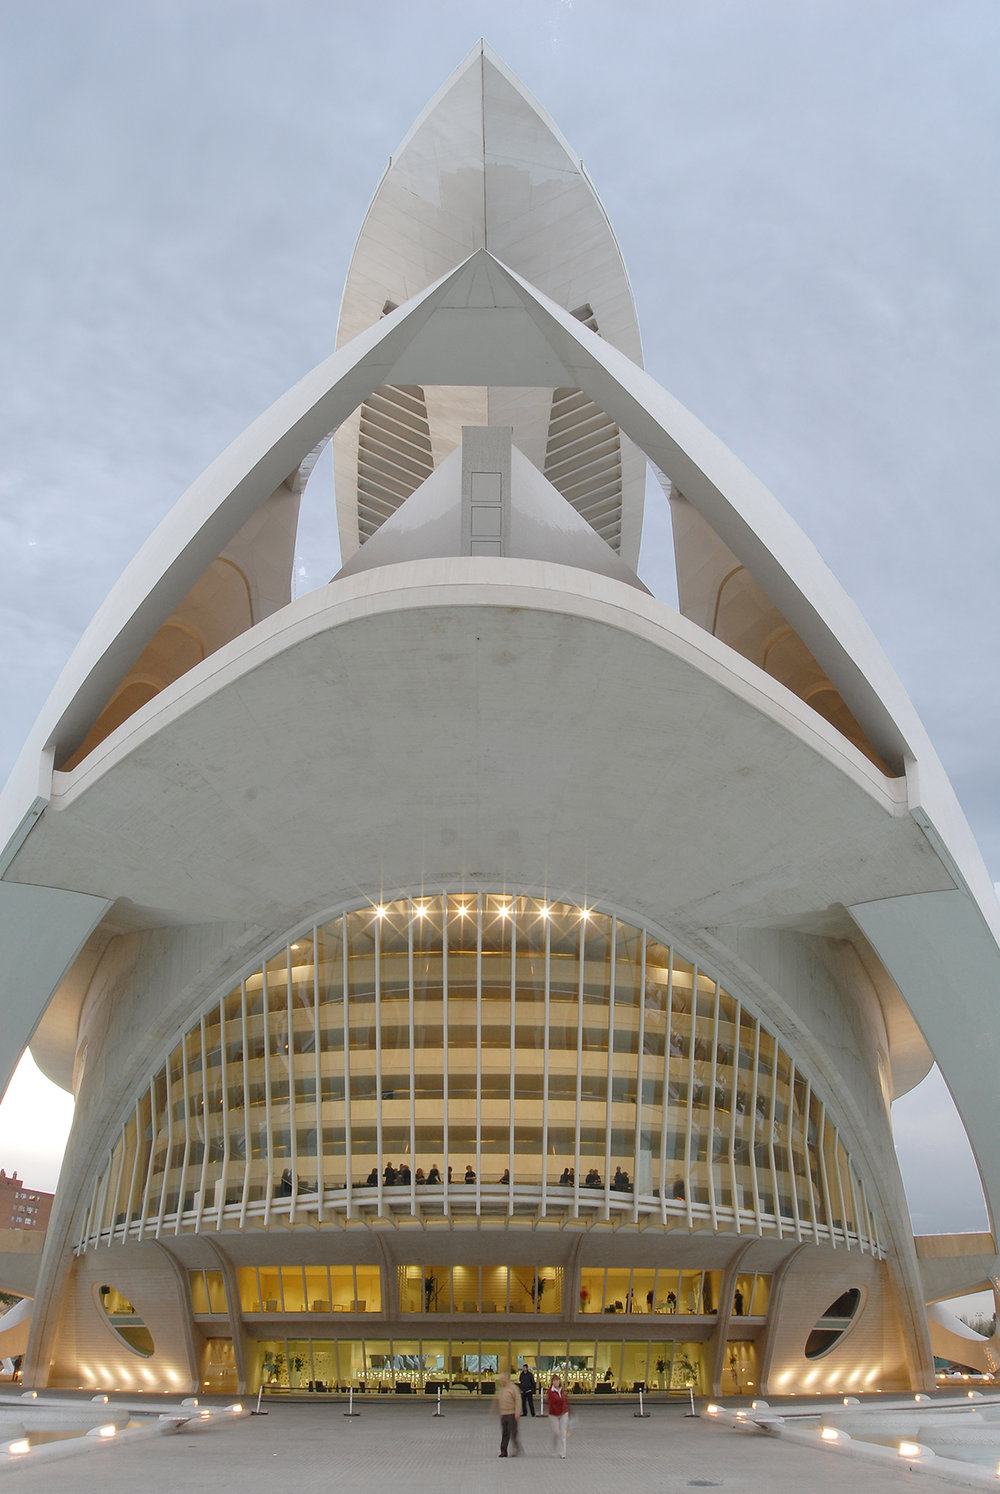 matka, matkablogi, Valencia, Espanja, matkailu, vero, kateus, palau de les arts reina sofia, moderni arkkitehtuuri